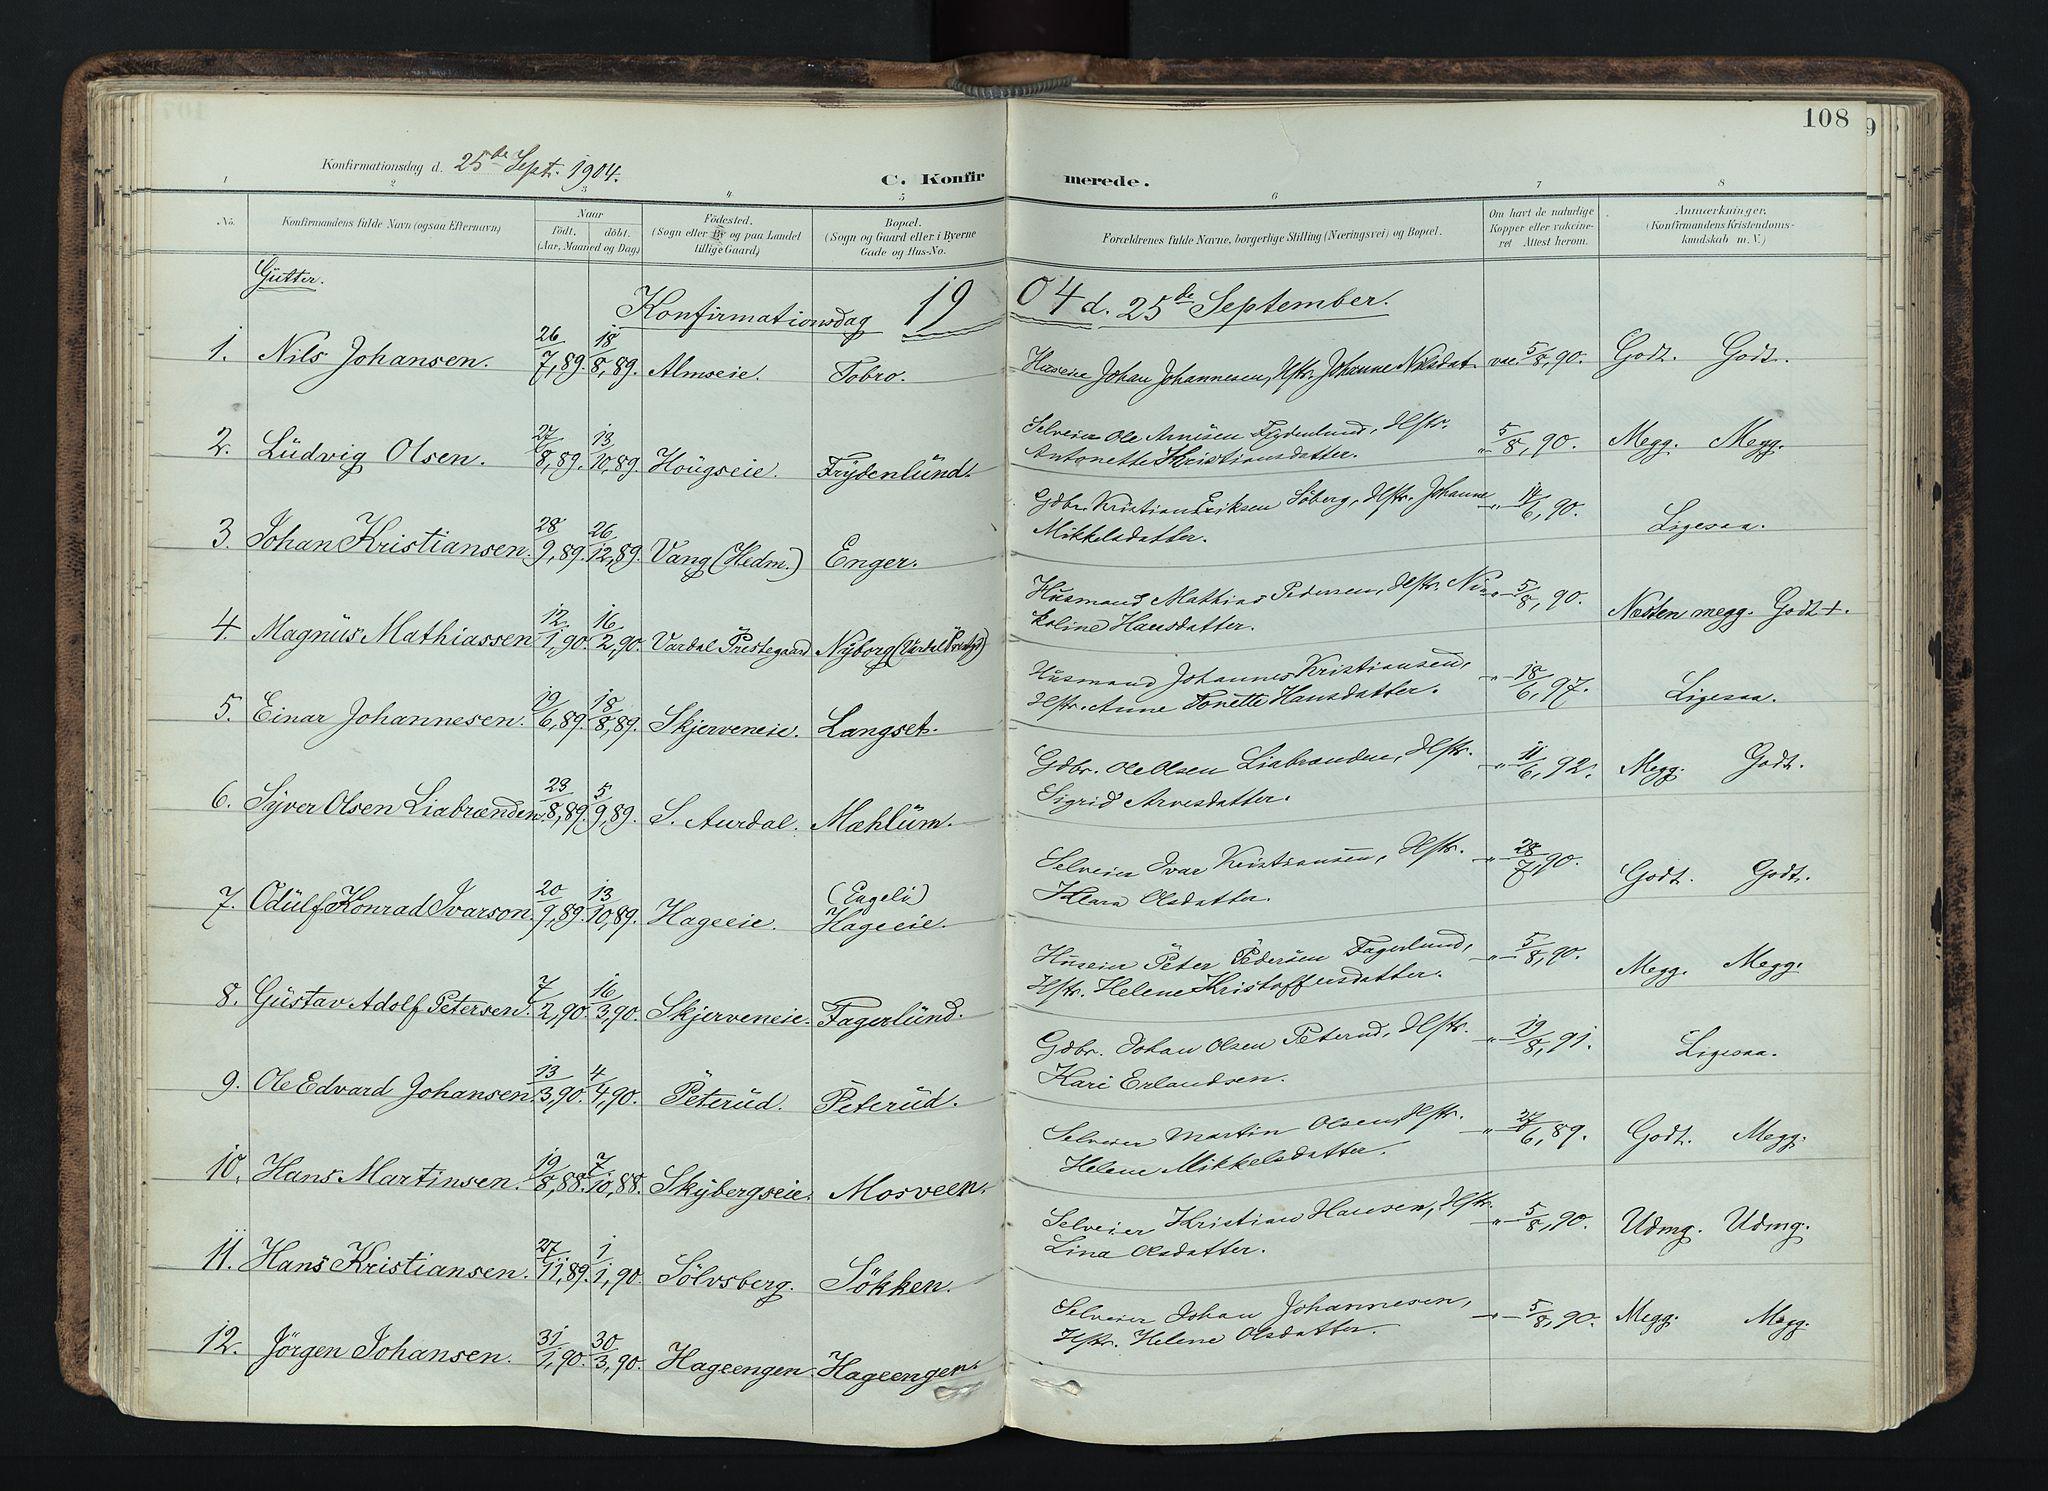 SAH, Vardal prestekontor, H/Ha/Haa/L0019: Ministerialbok nr. 19, 1893-1907, s. 108